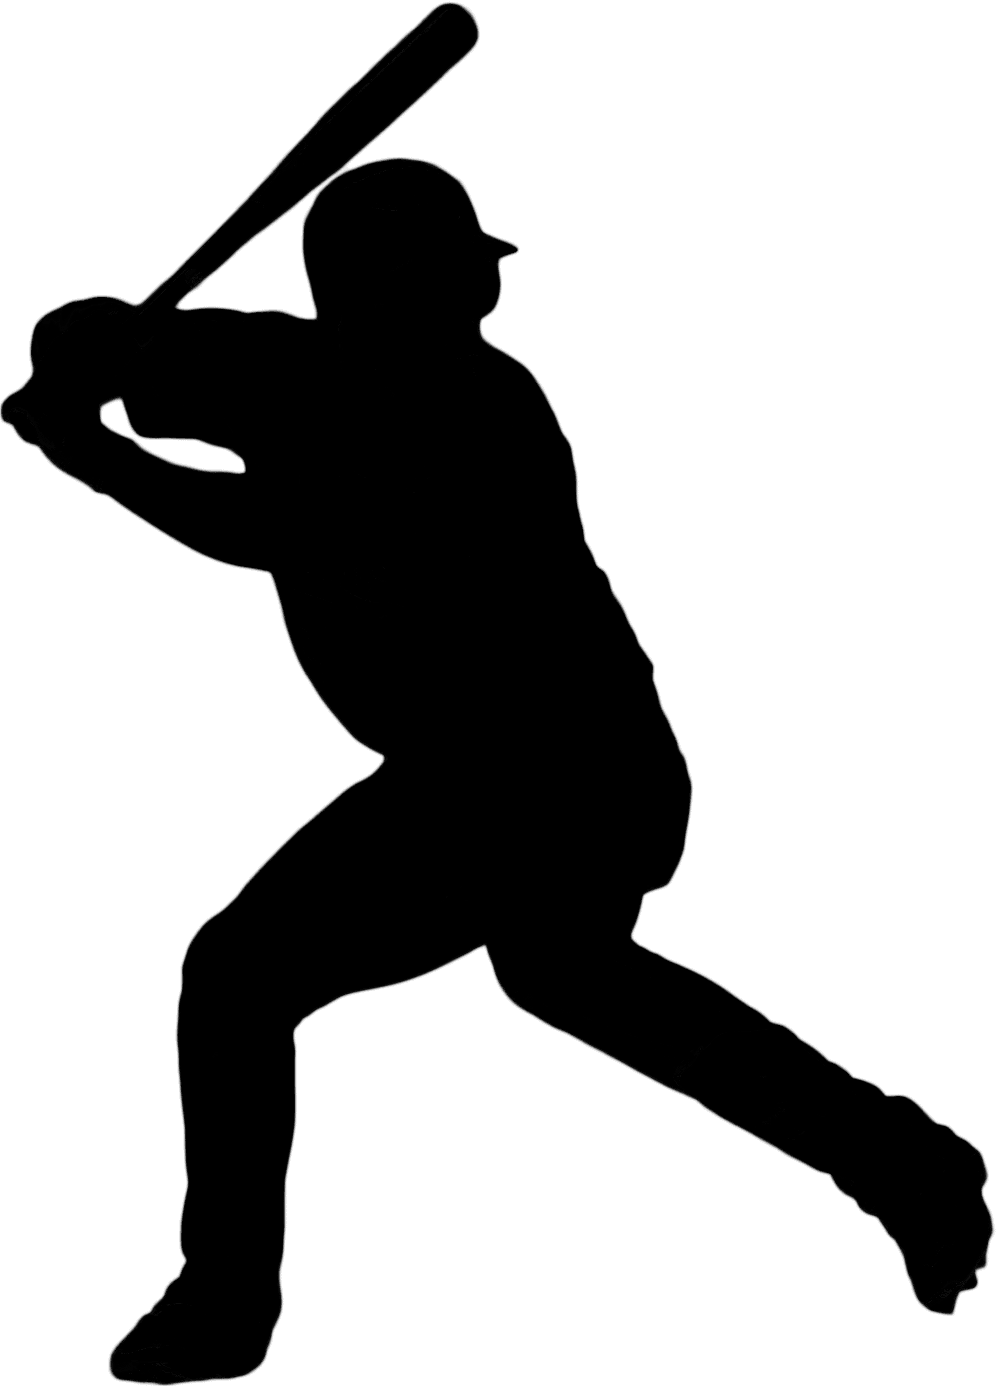 Silhouette Clip art Baseball Softball Portable Network.